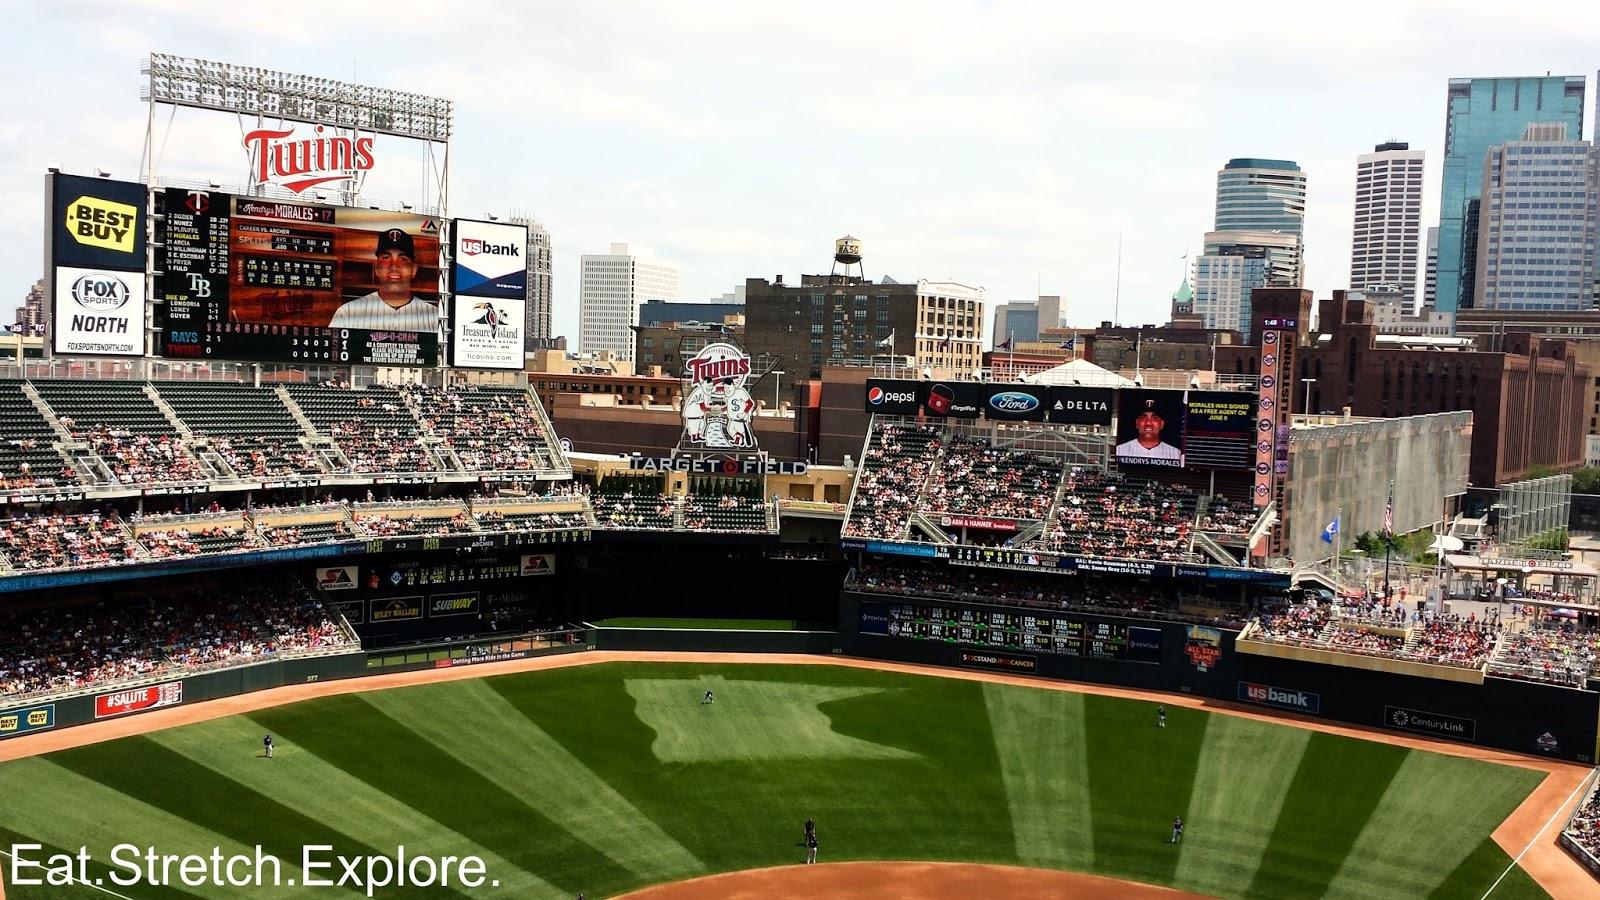 Minneapolis Mn Metropolitan Club At Target Field Season